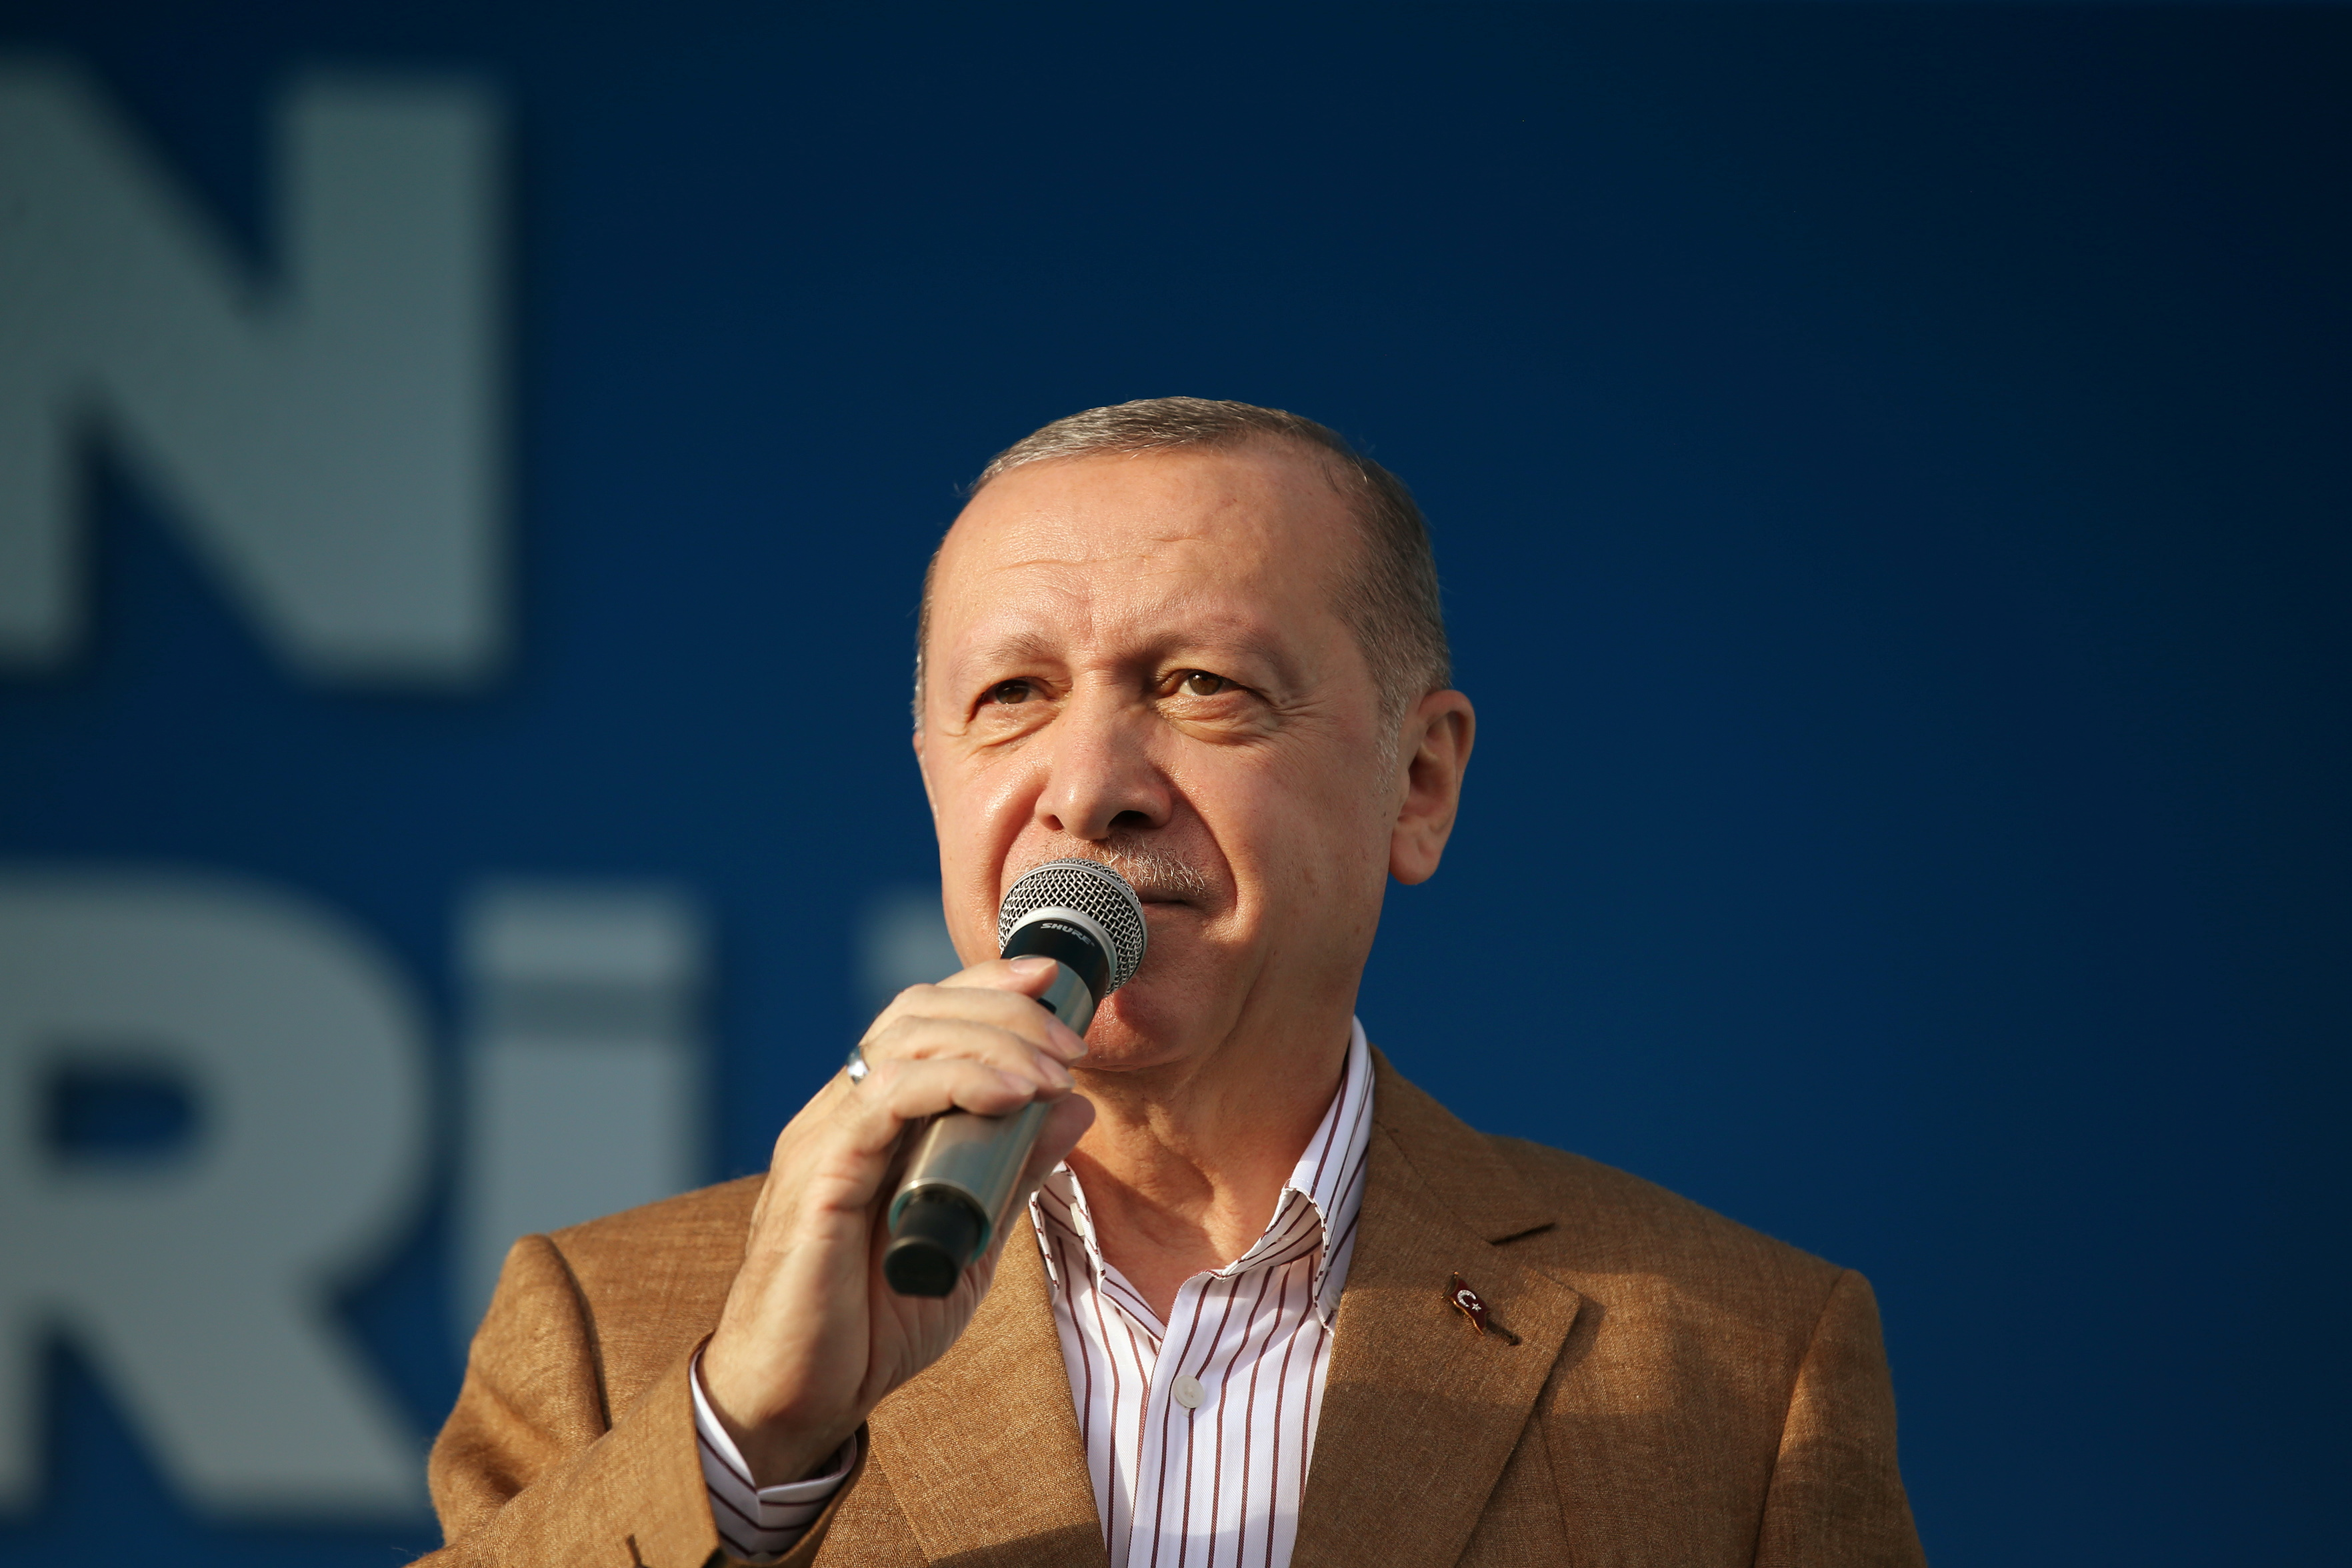 Presidente da Turquia, Tayyip Erdogan